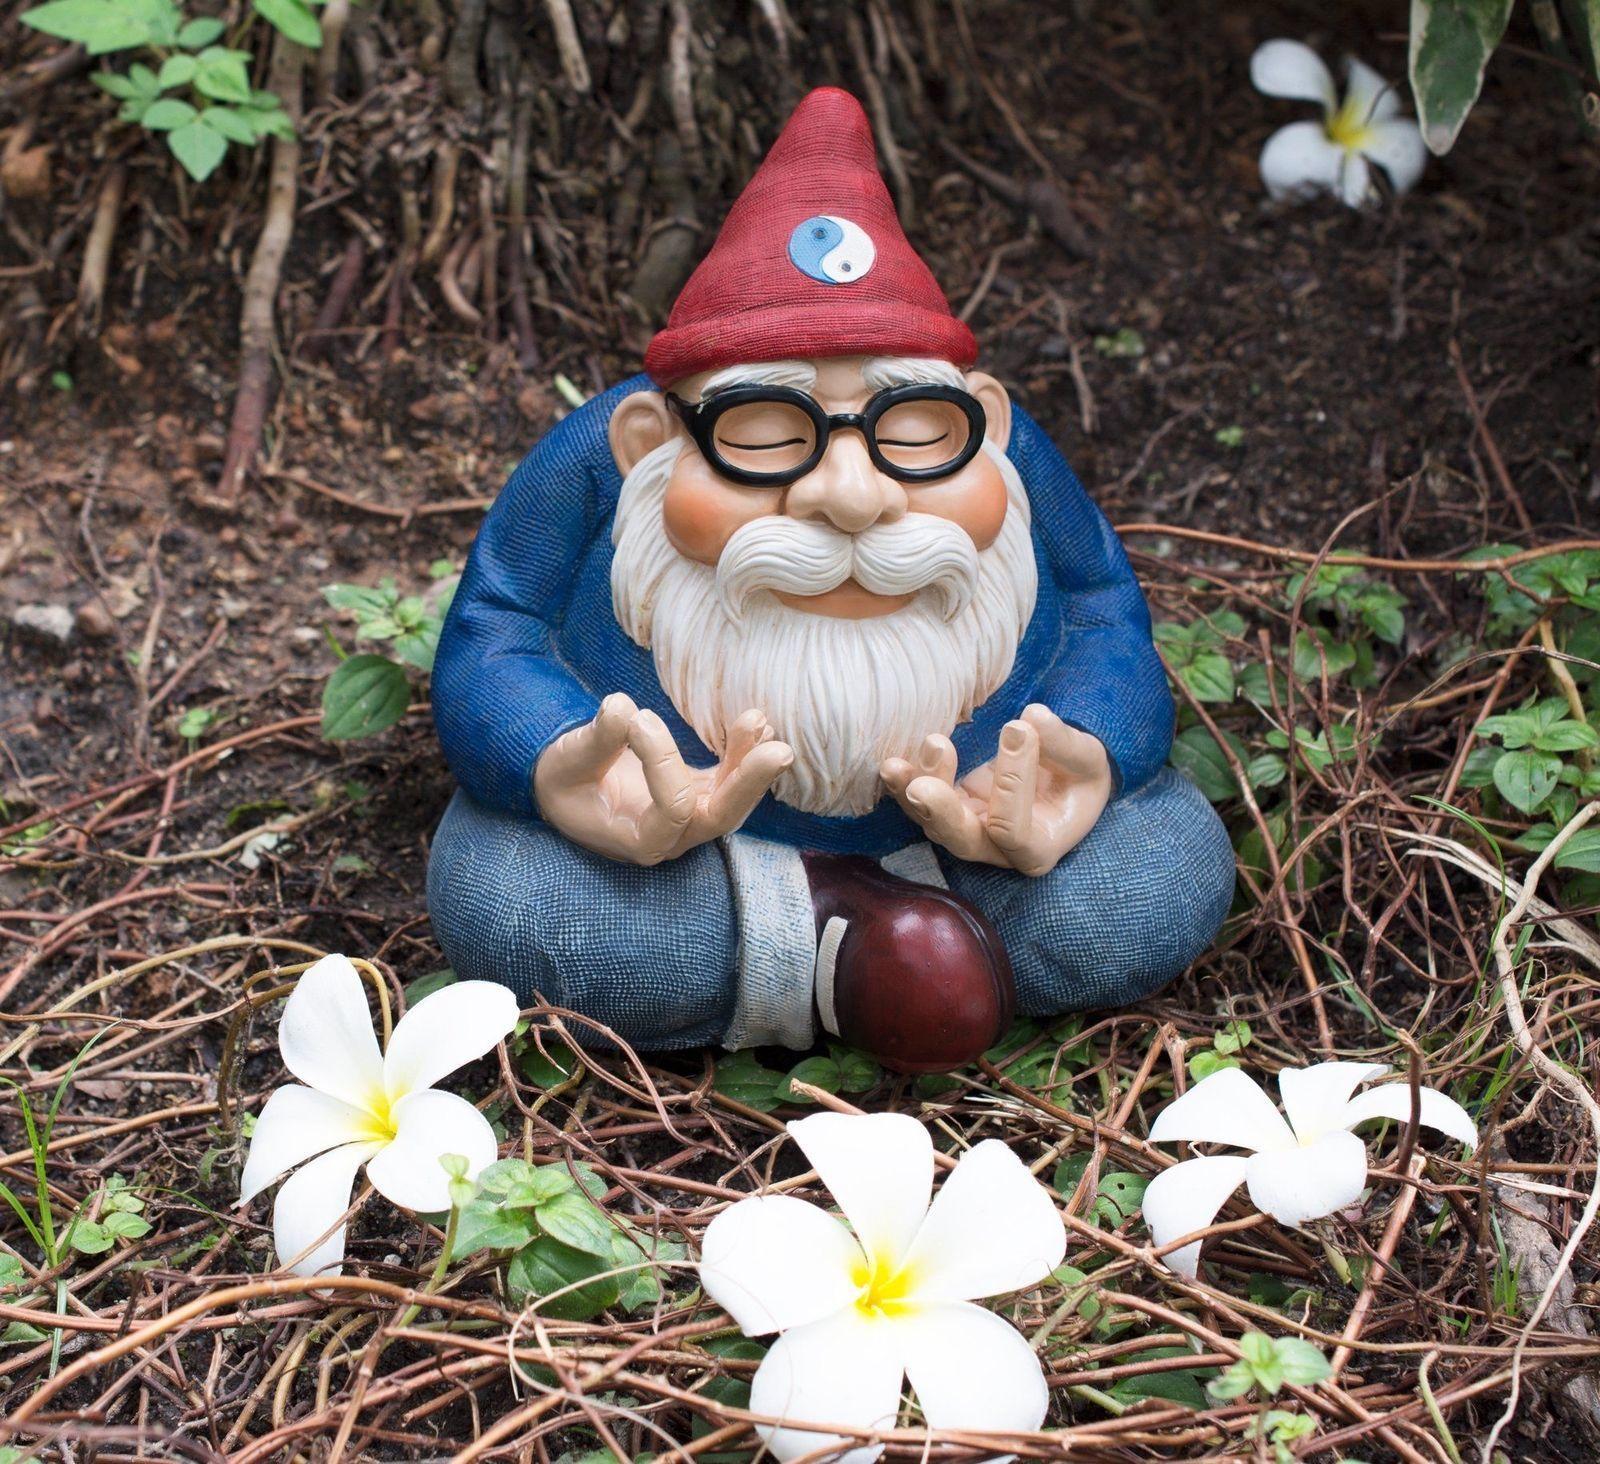 Garden Gnome Statue Sculpture Figure